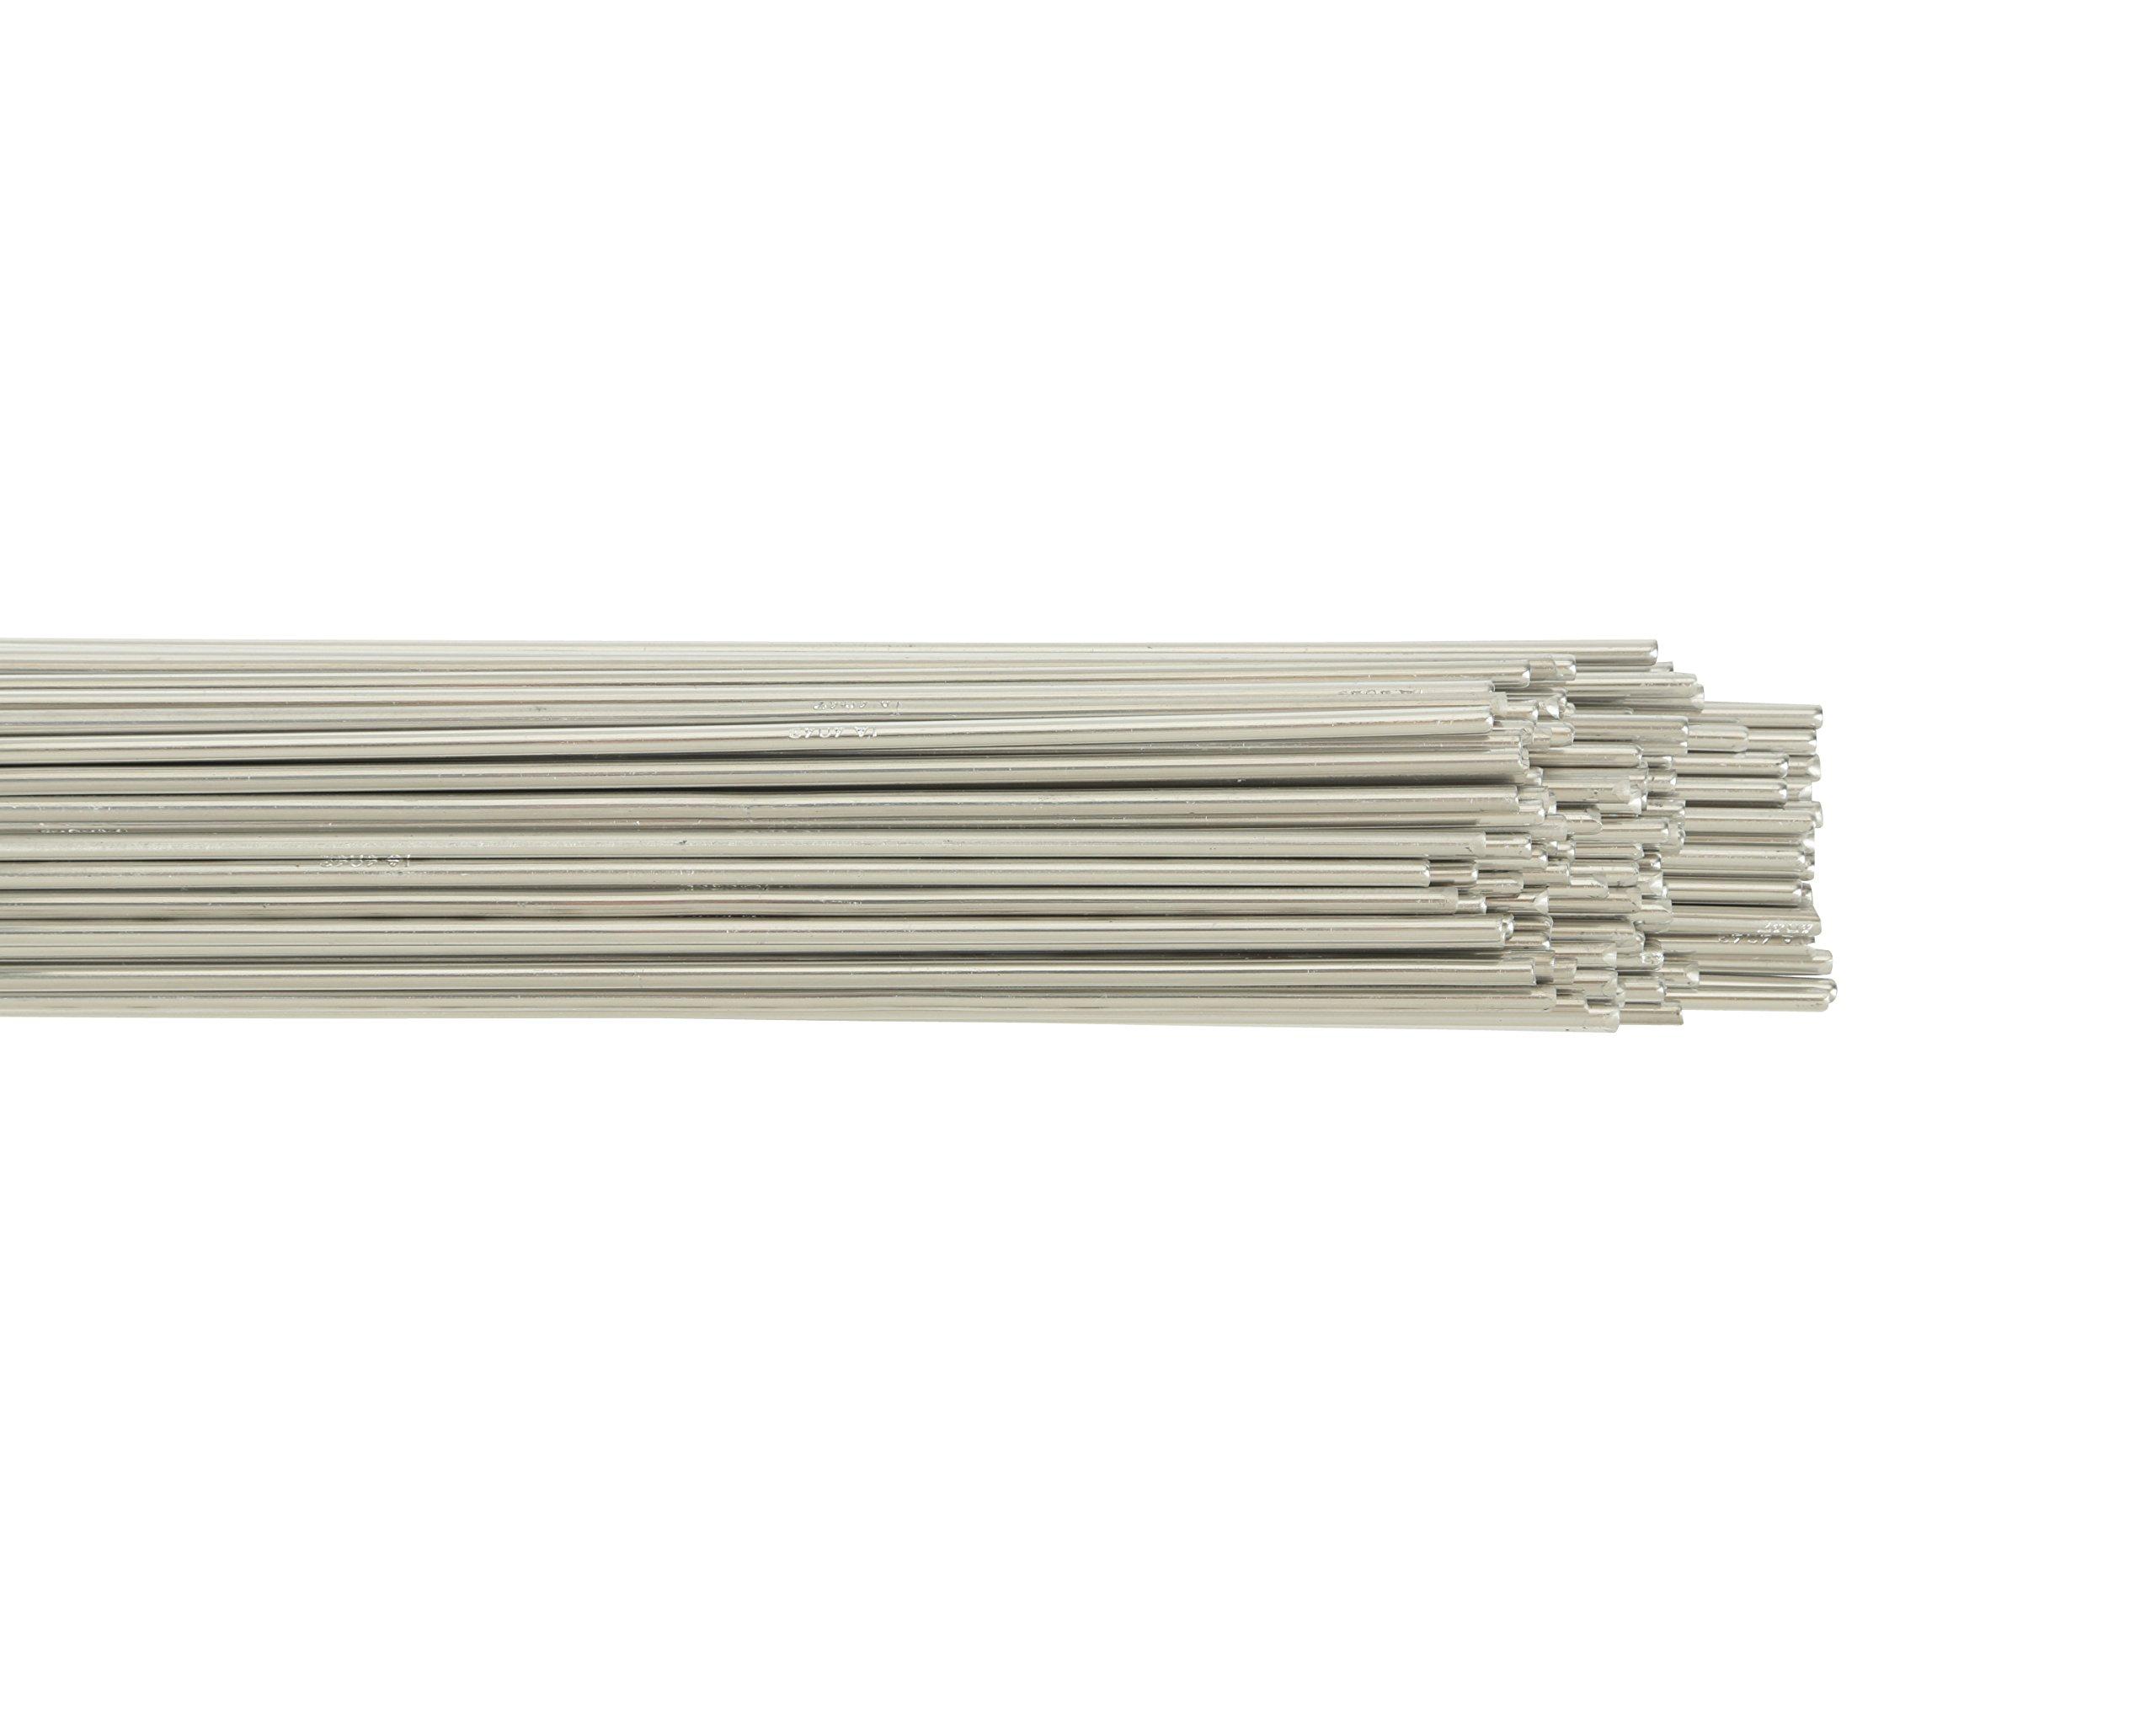 Harris 04043505 4043 Aluminum TIG Welding Rod, 3/32